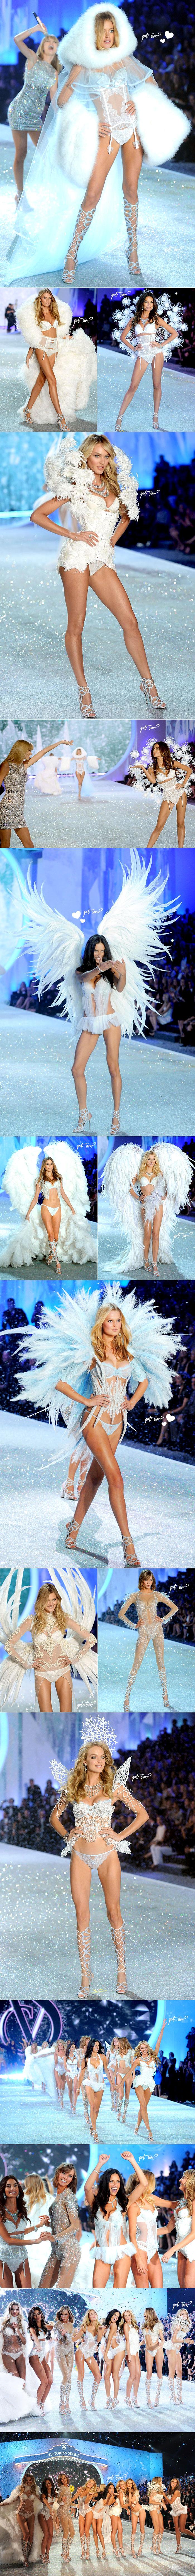 desfile-victorias-secret-fashion-show-blog-got-sin-snow-angels-3d-print-doutzen-kroes-adriana-lima-candice-swanepoel-taylor-swift-lingerie-azul-branca